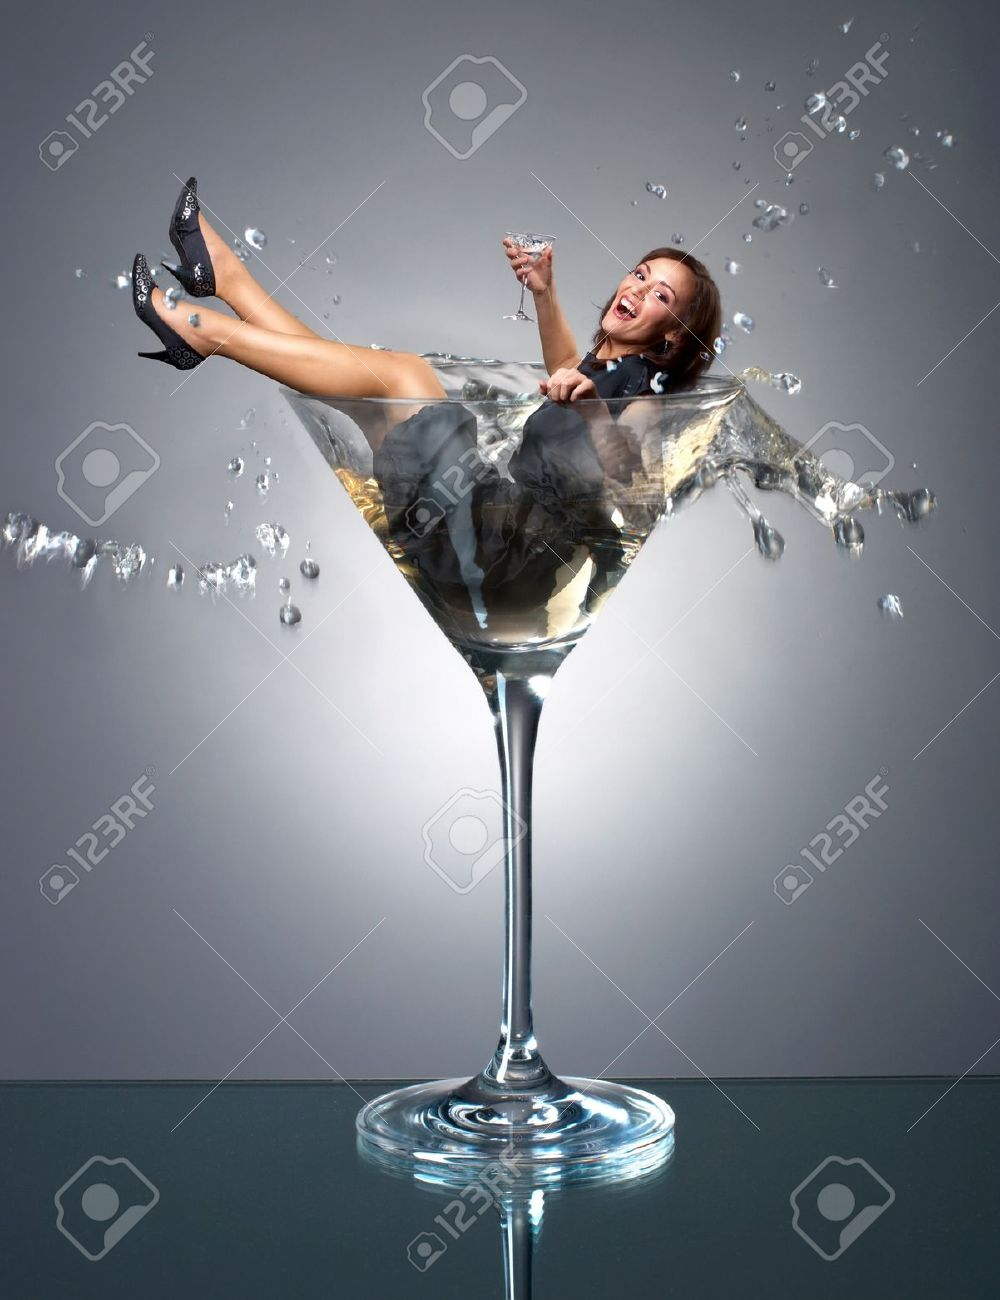 Smilng girl fall in martini glass Stock Photo - 12535100